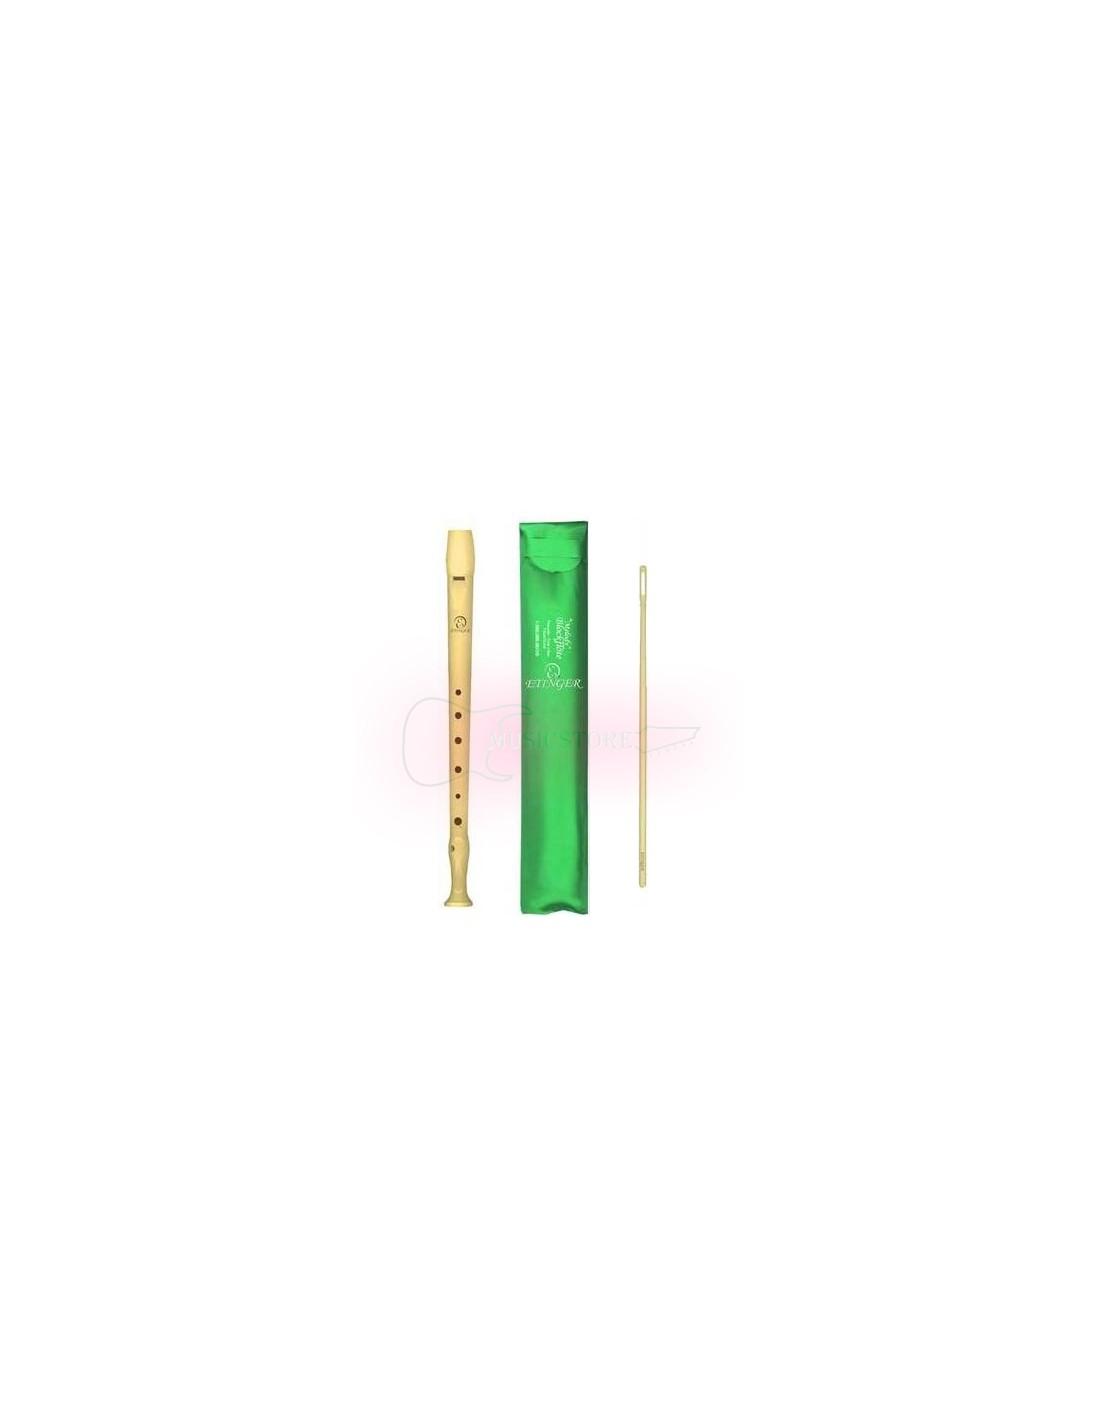 Flauta Dulce Soprano digitacion alemana B9508 Etinger